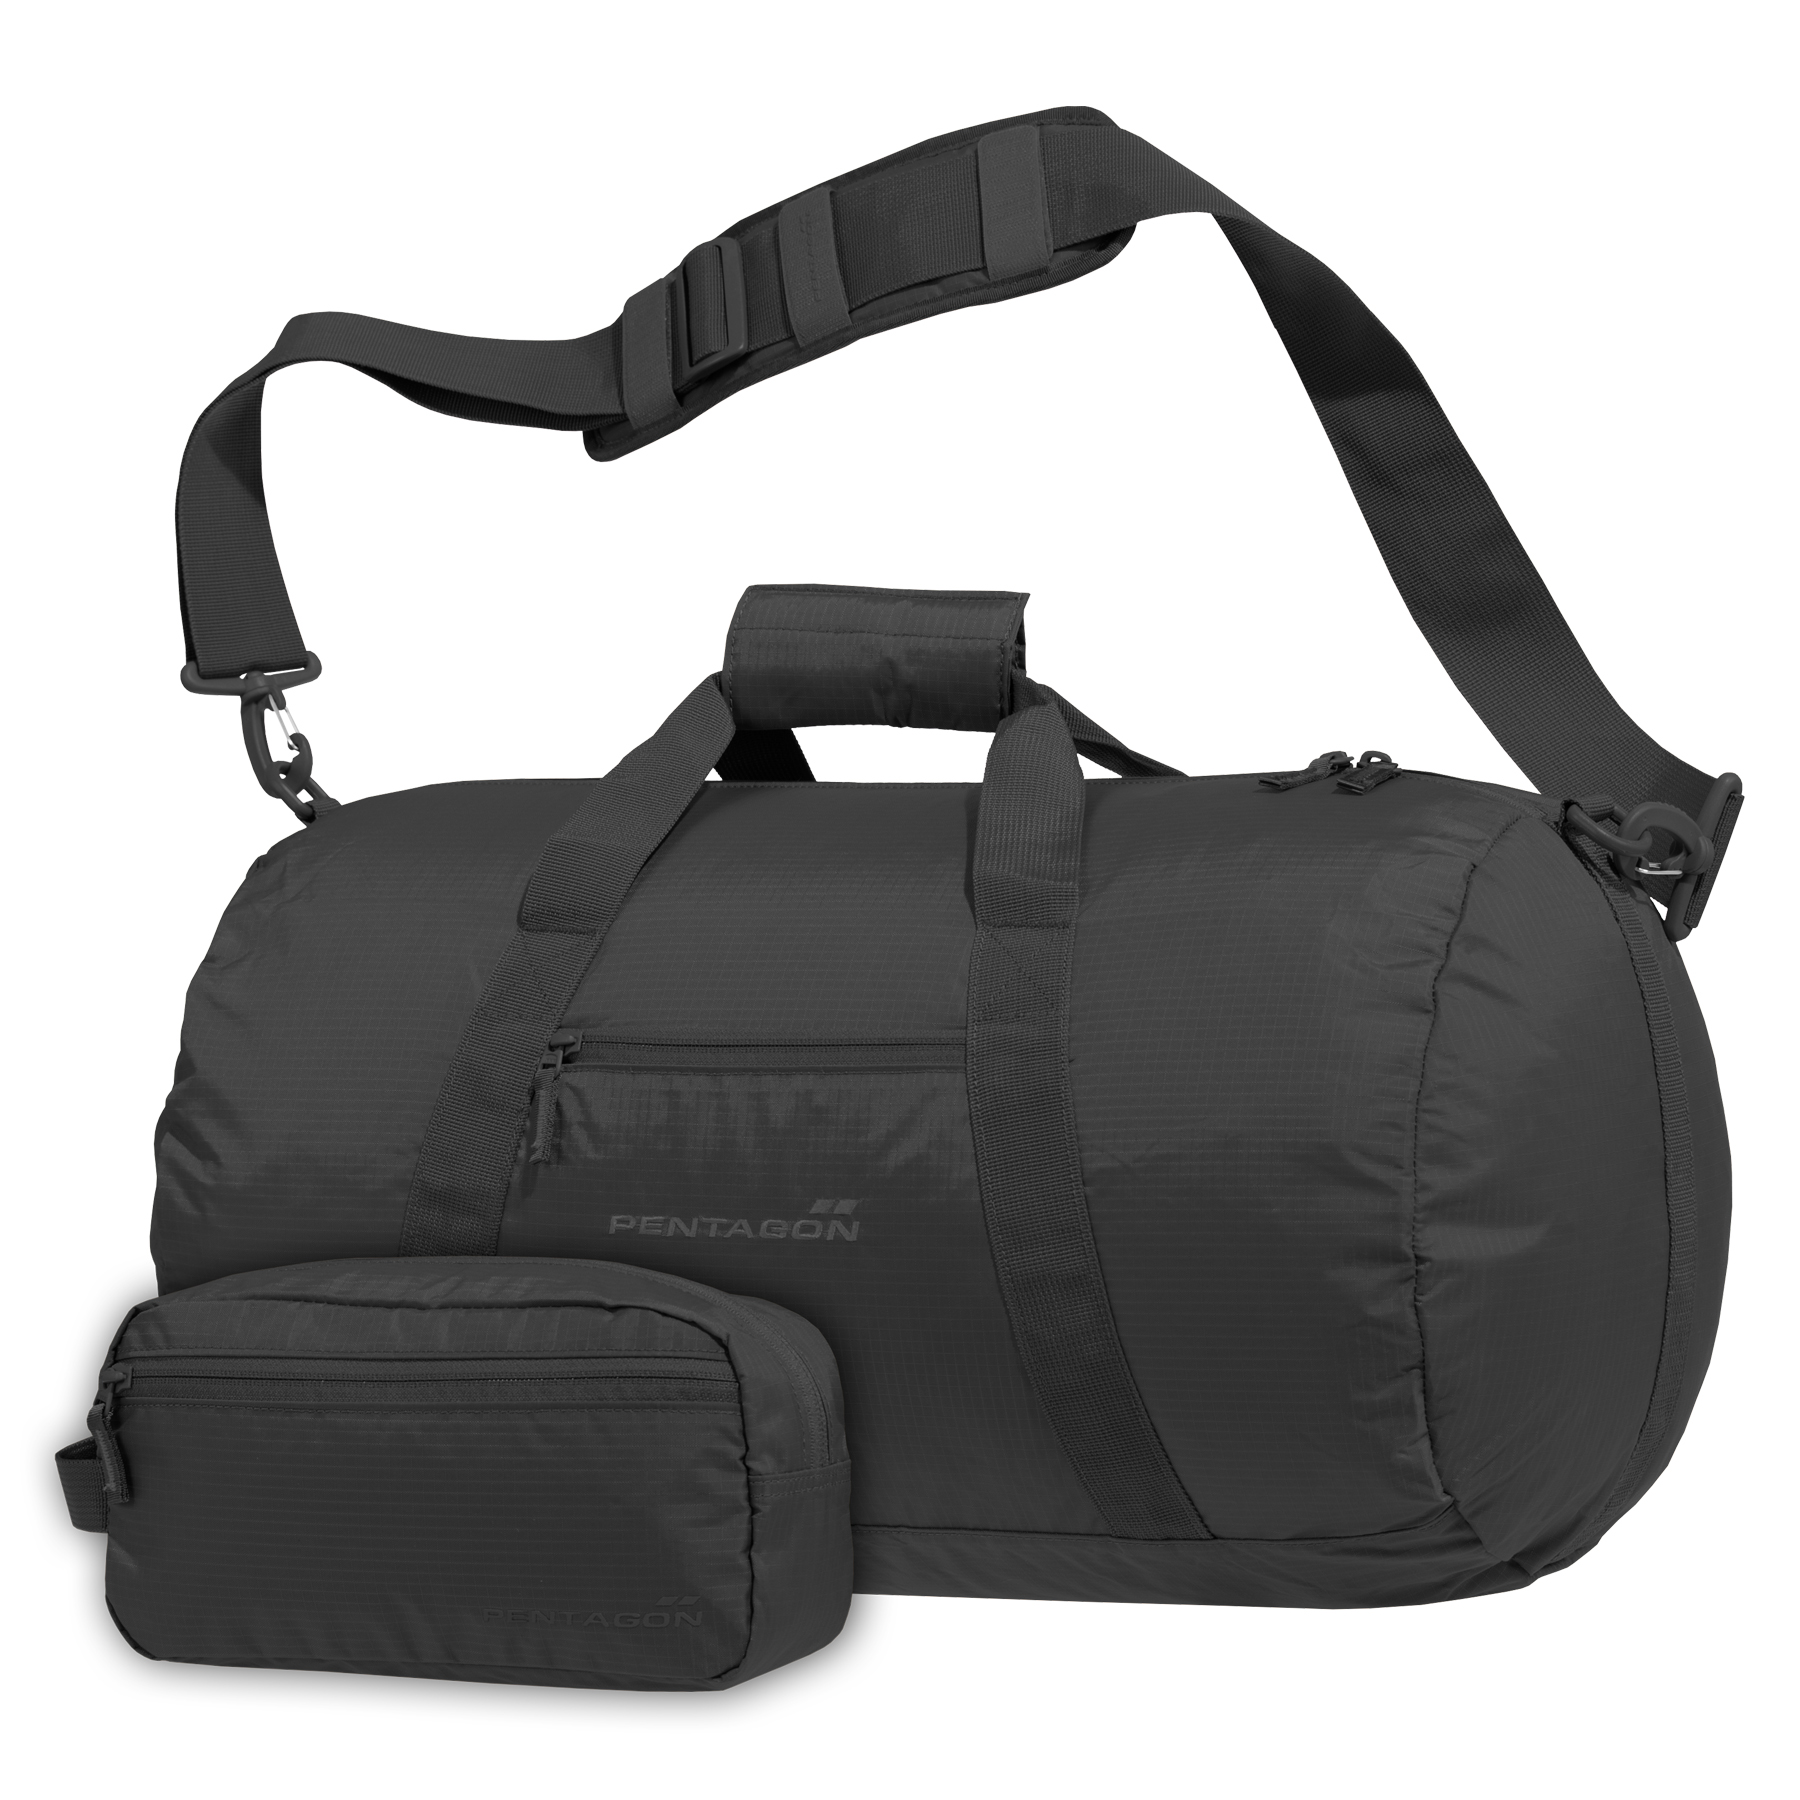 cebcbe3545 Σακίδιο Pentagon Kanon Duffle Bag K16102